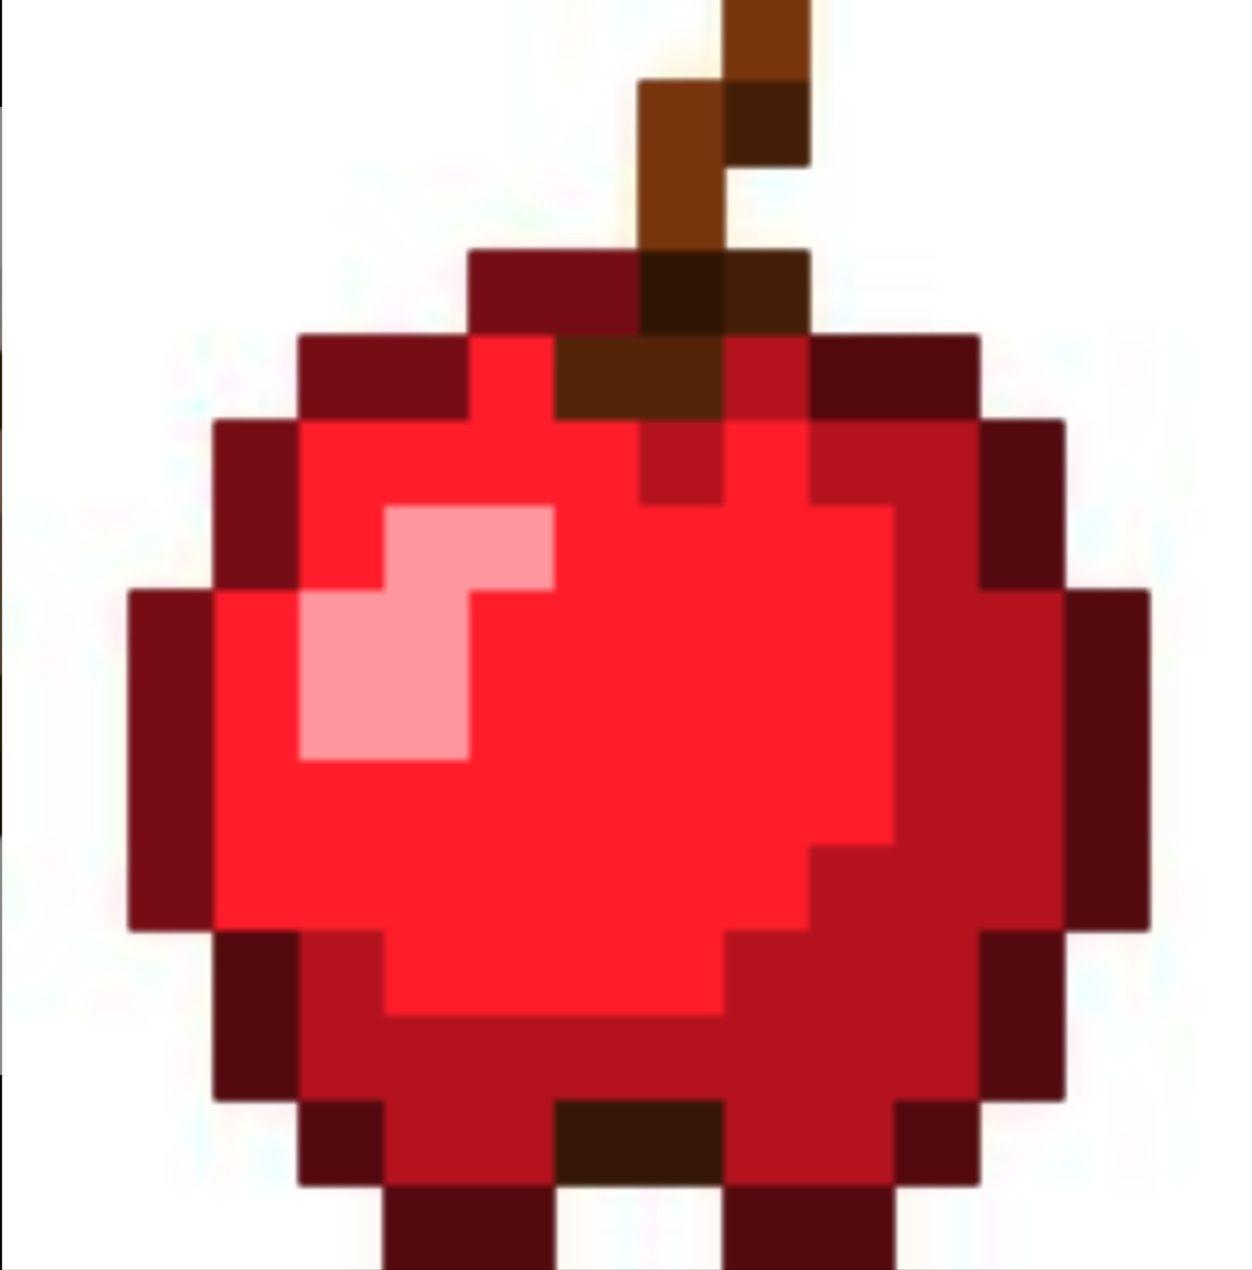 Pin by Ibukun on Video games Pinterest Minecraft, Hama